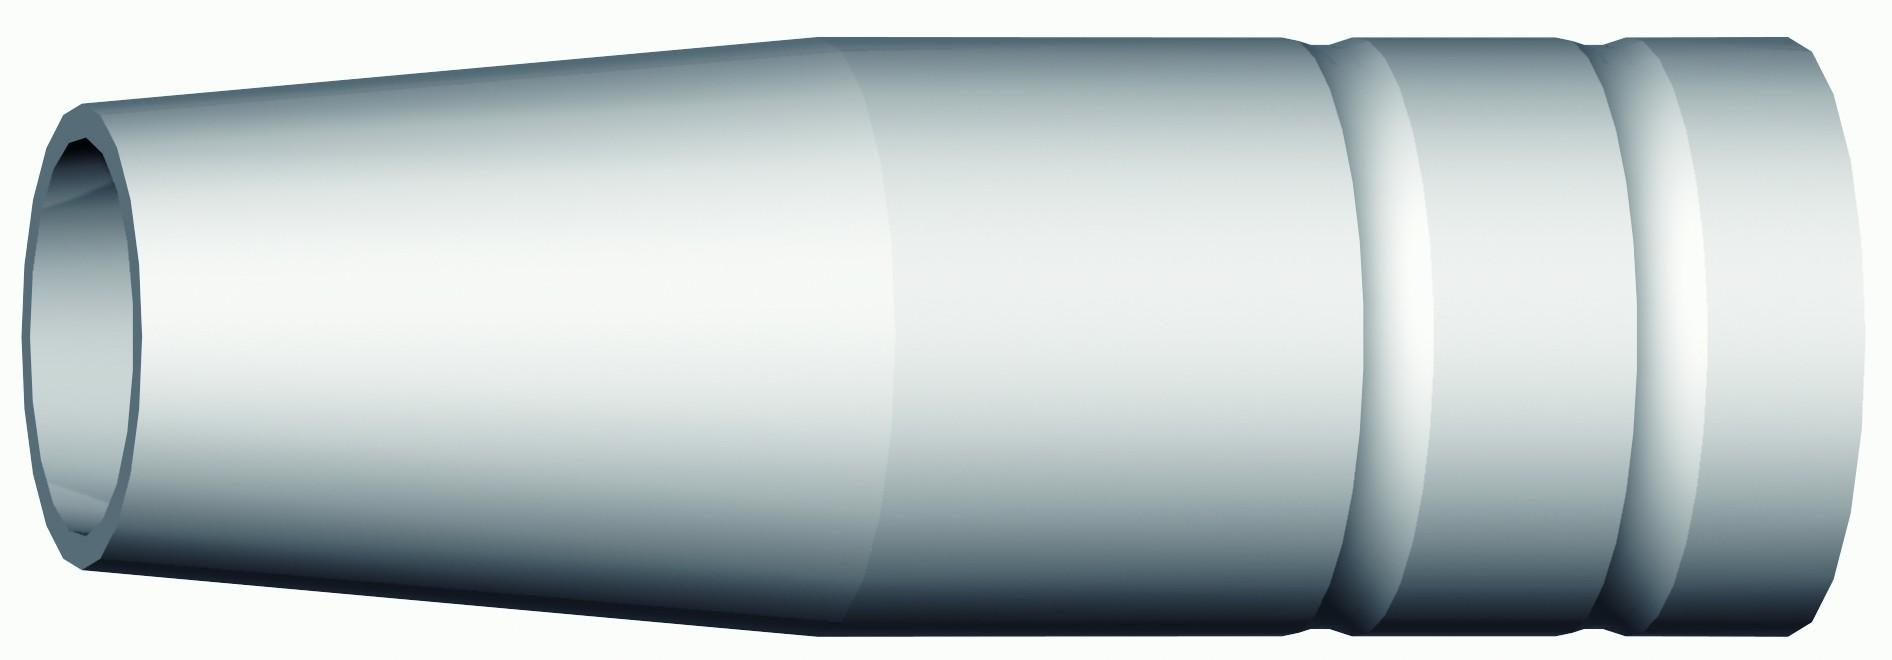 MB15 Tapered Shroud